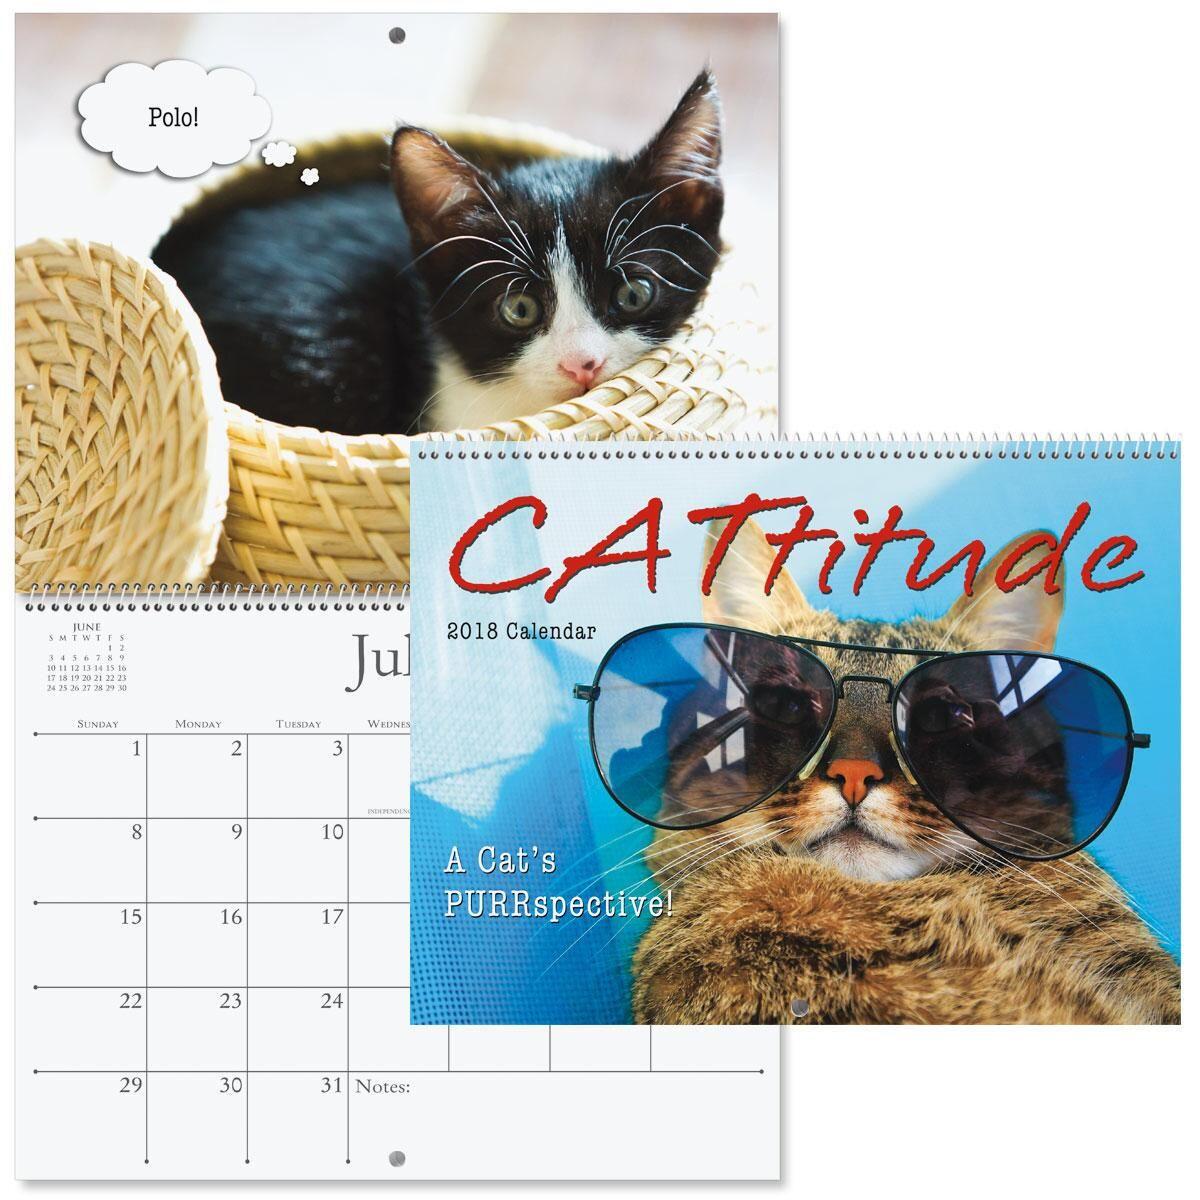 2018 Cattitudes Wall Calendar